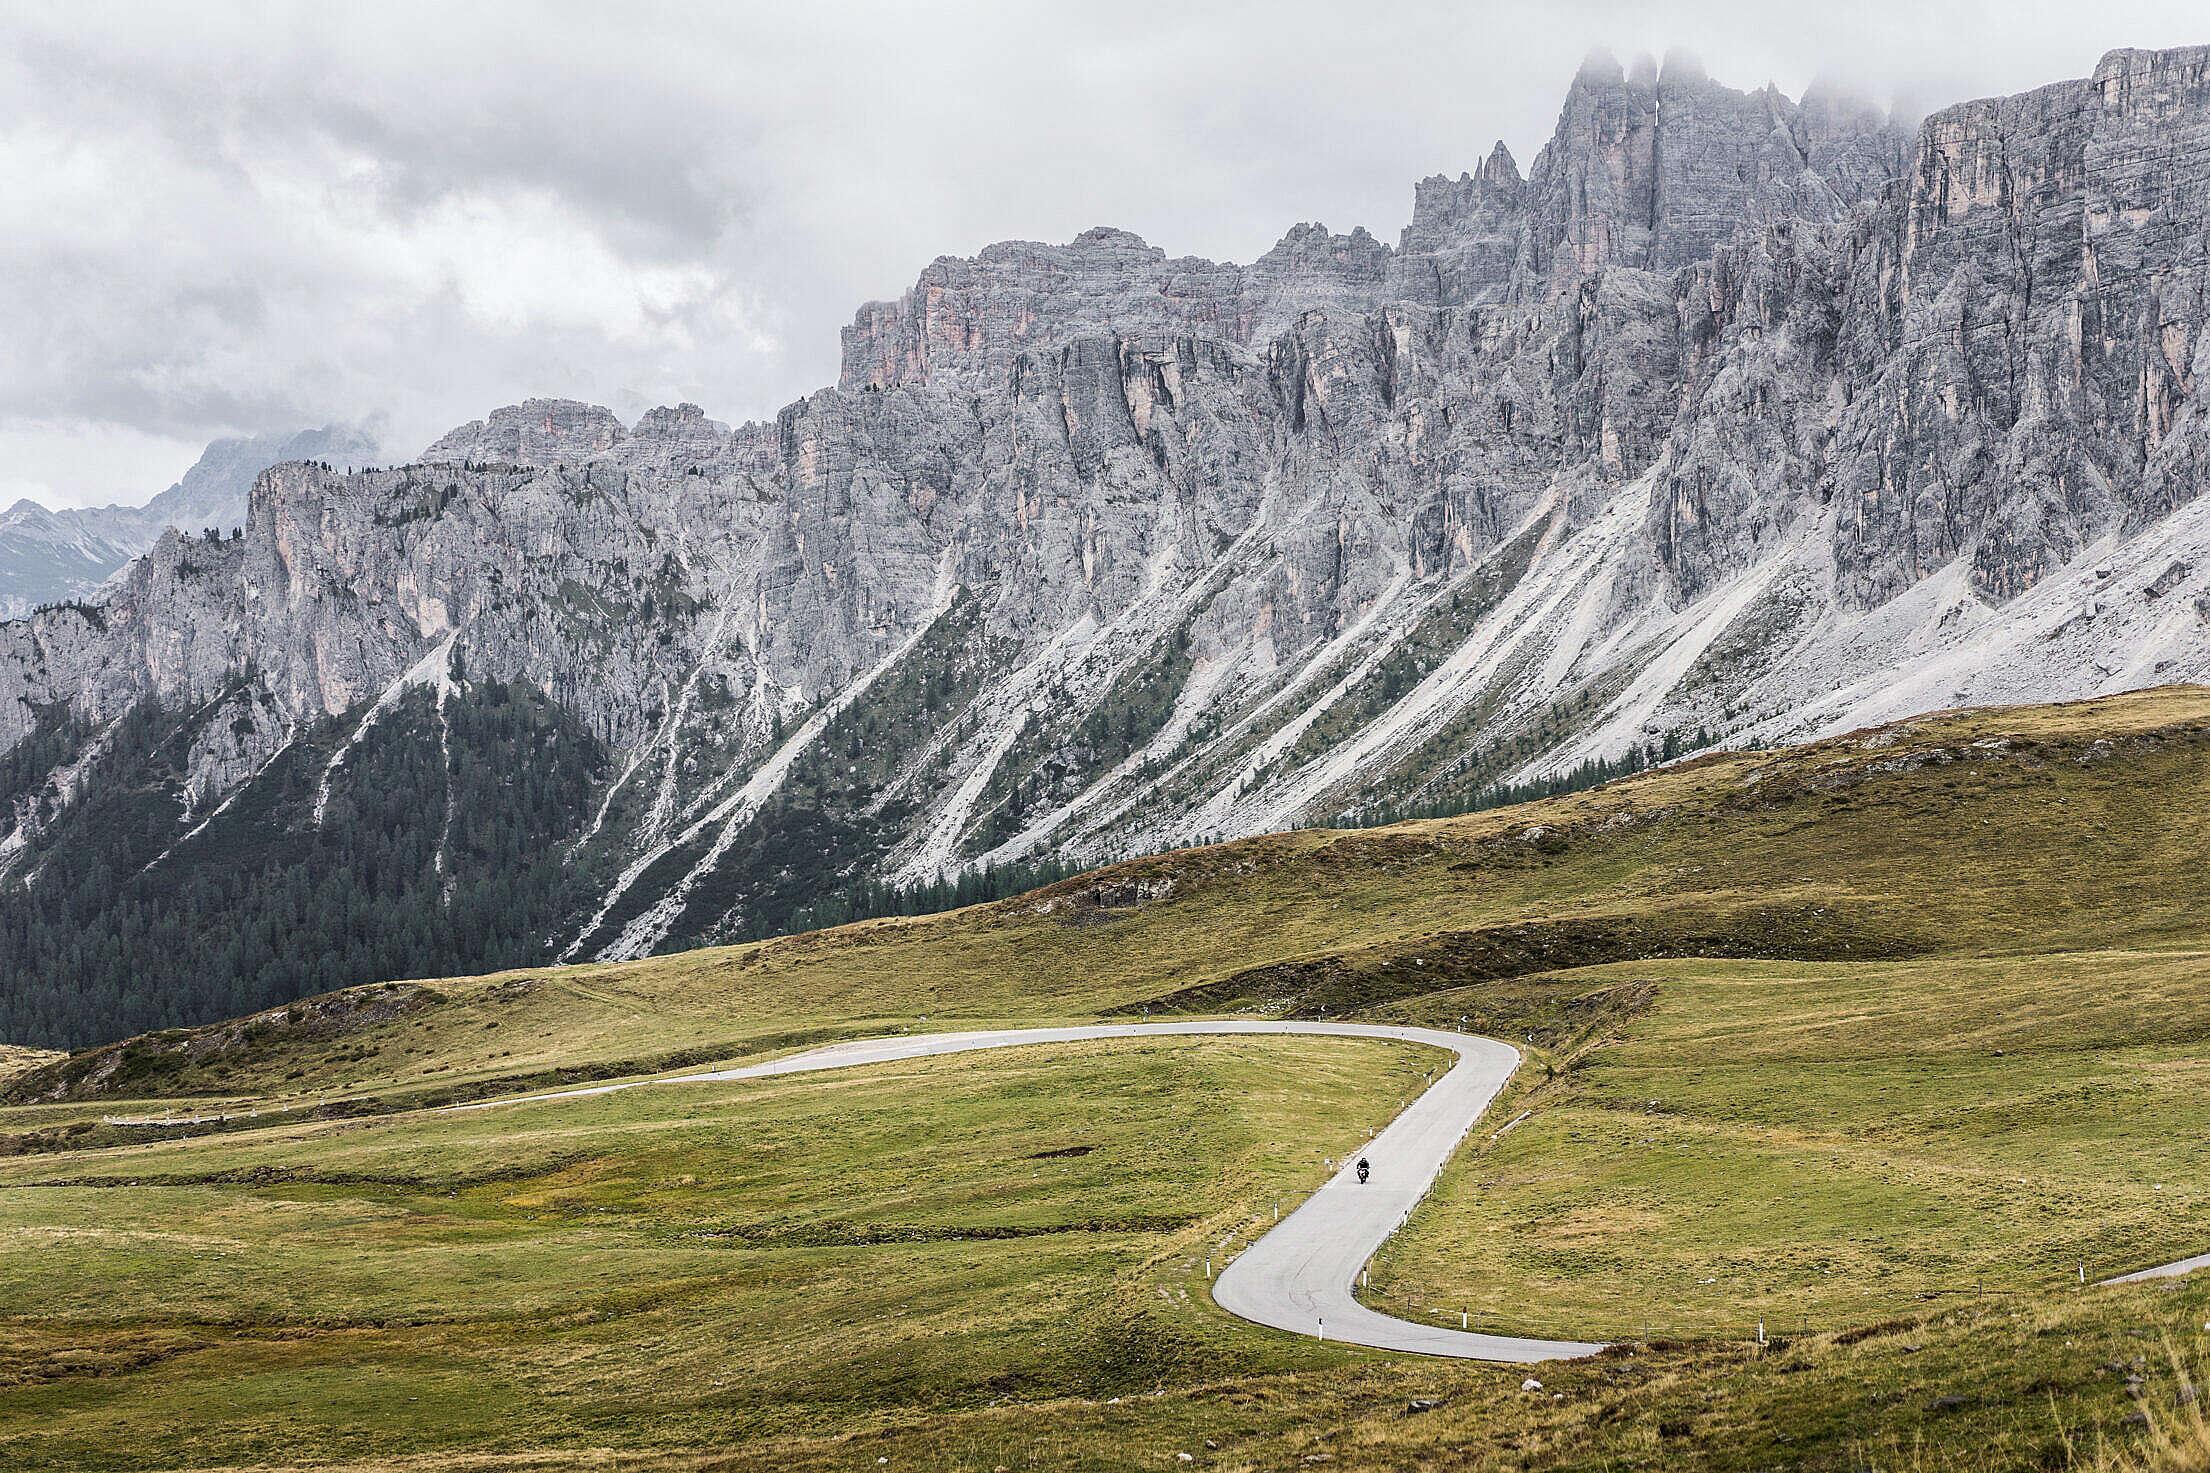 Beautiful Mountains & Roads Around Giau Pass in Italy Free Stock Photo